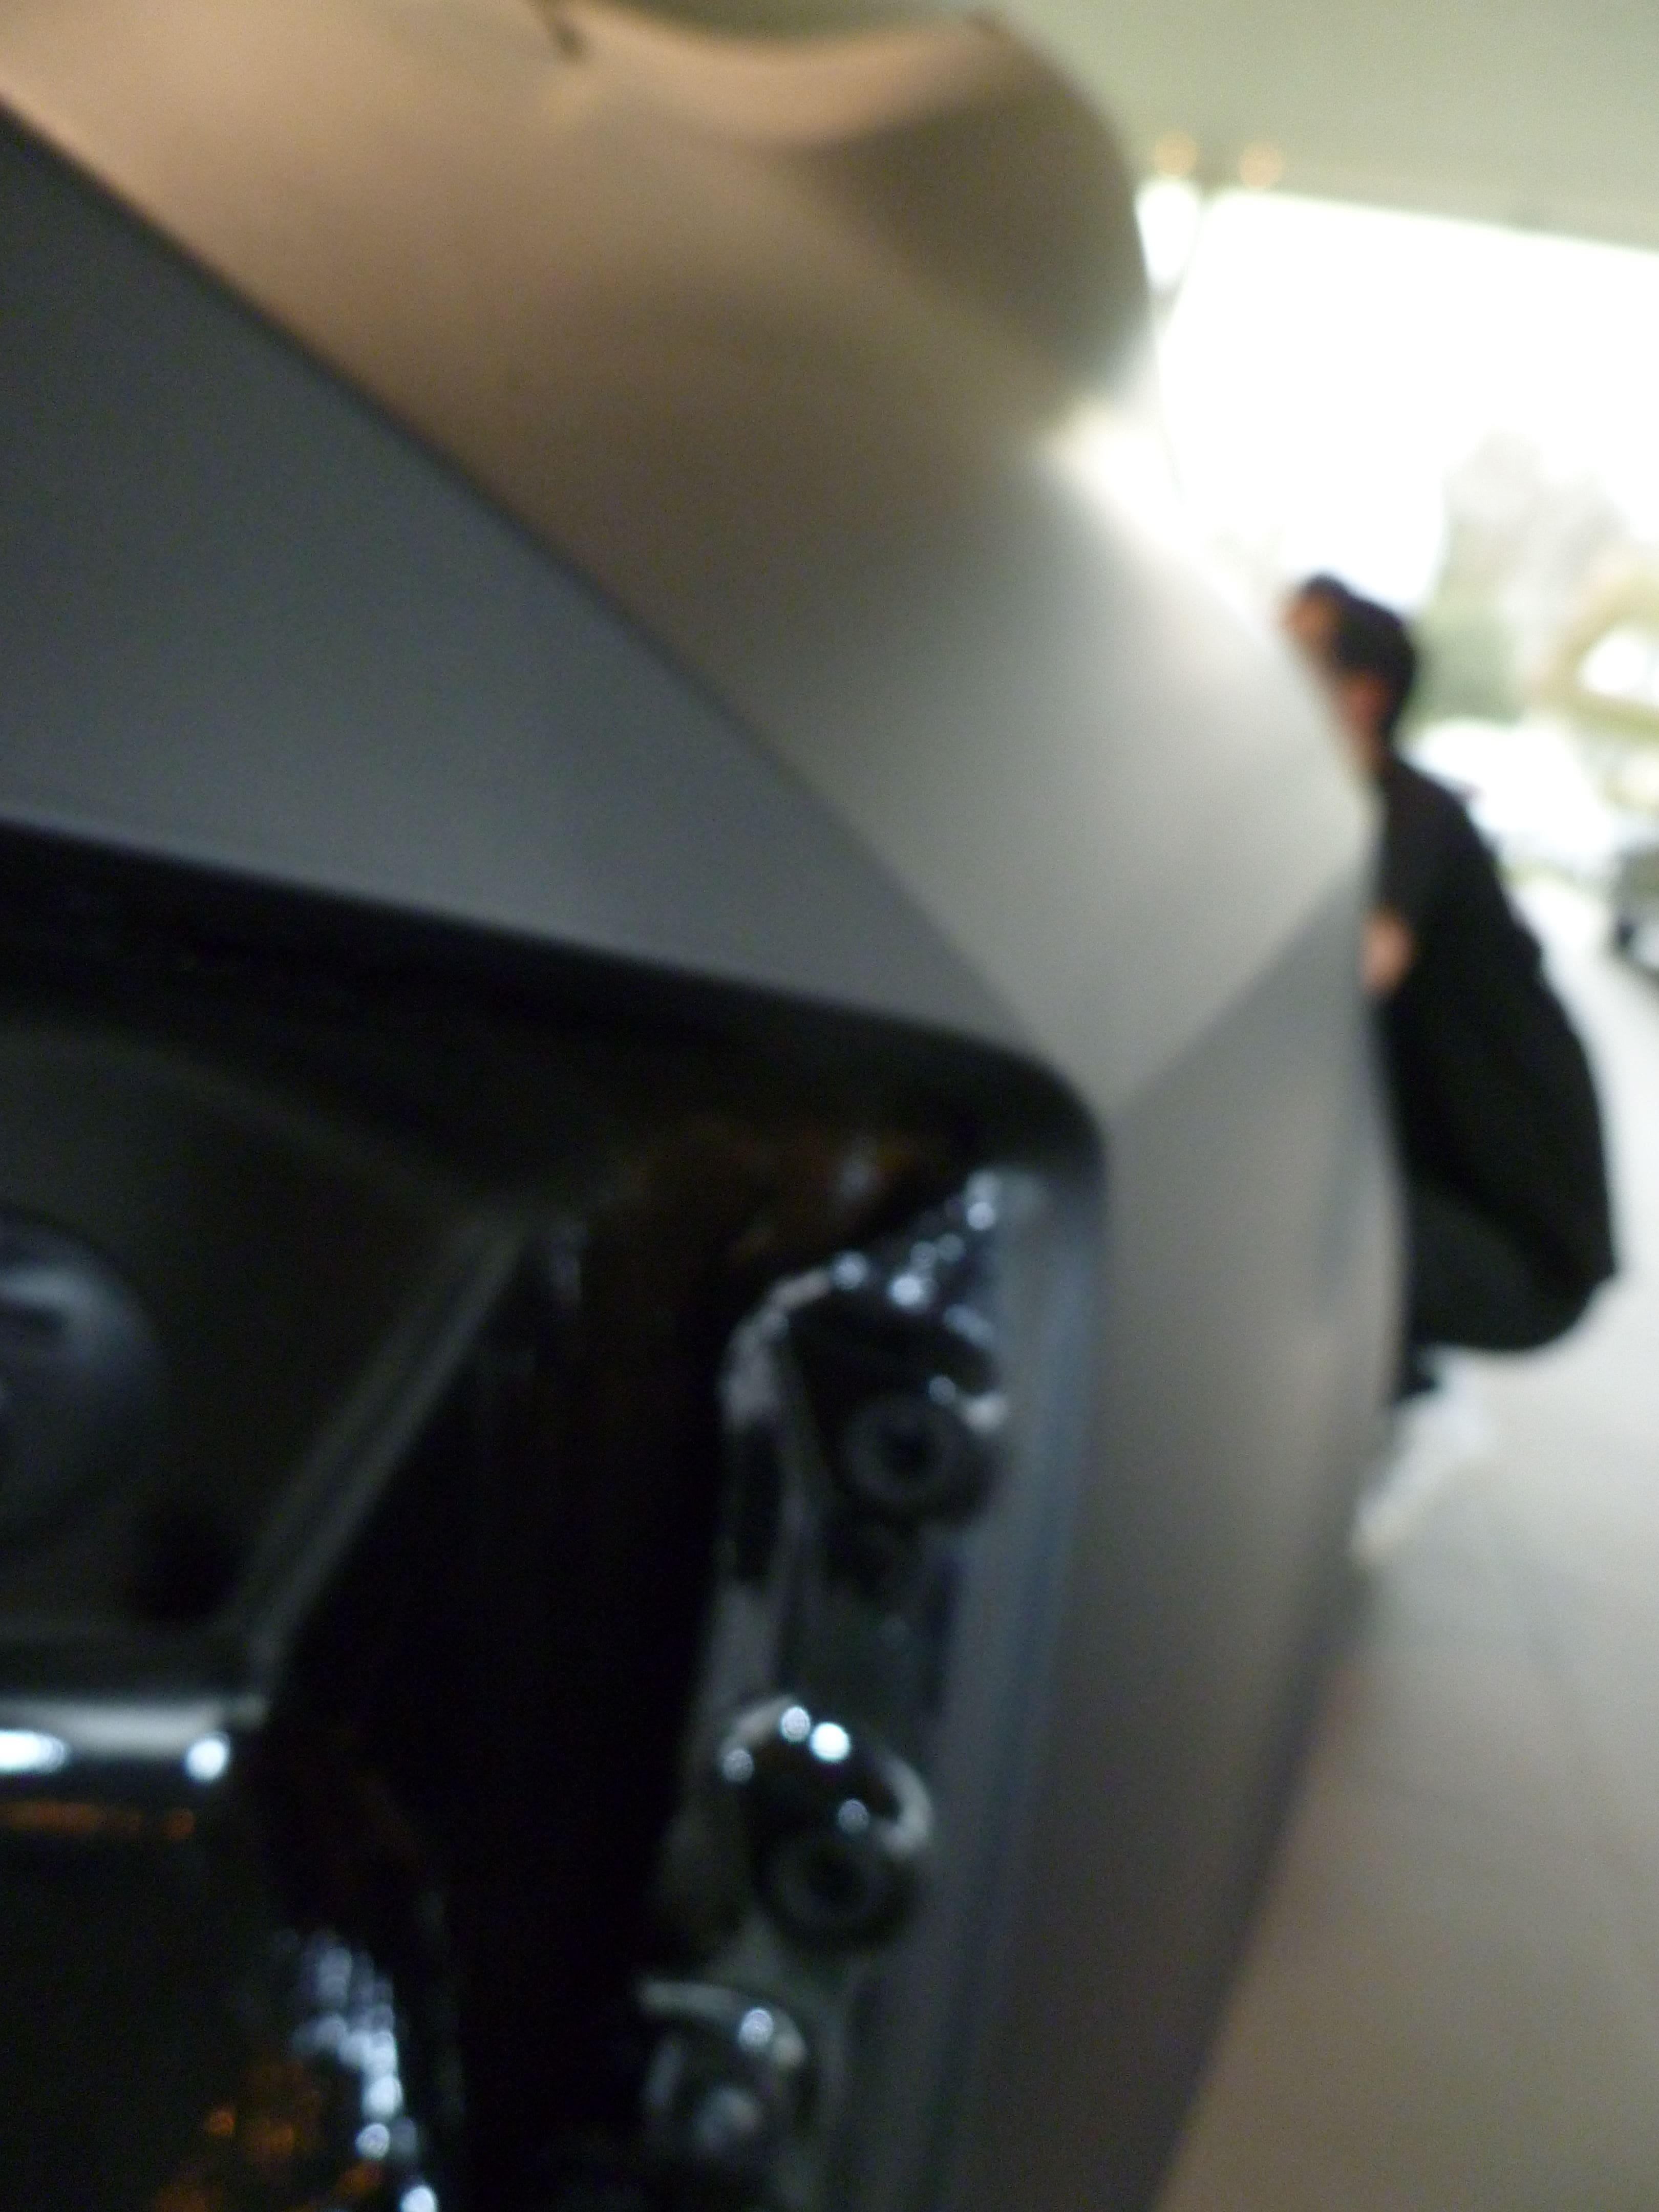 Audi A5 Coupe met Mat Zwarte Wrap, Carwrapping door Wrapmyride.nu Foto-nr:4628, ©2021